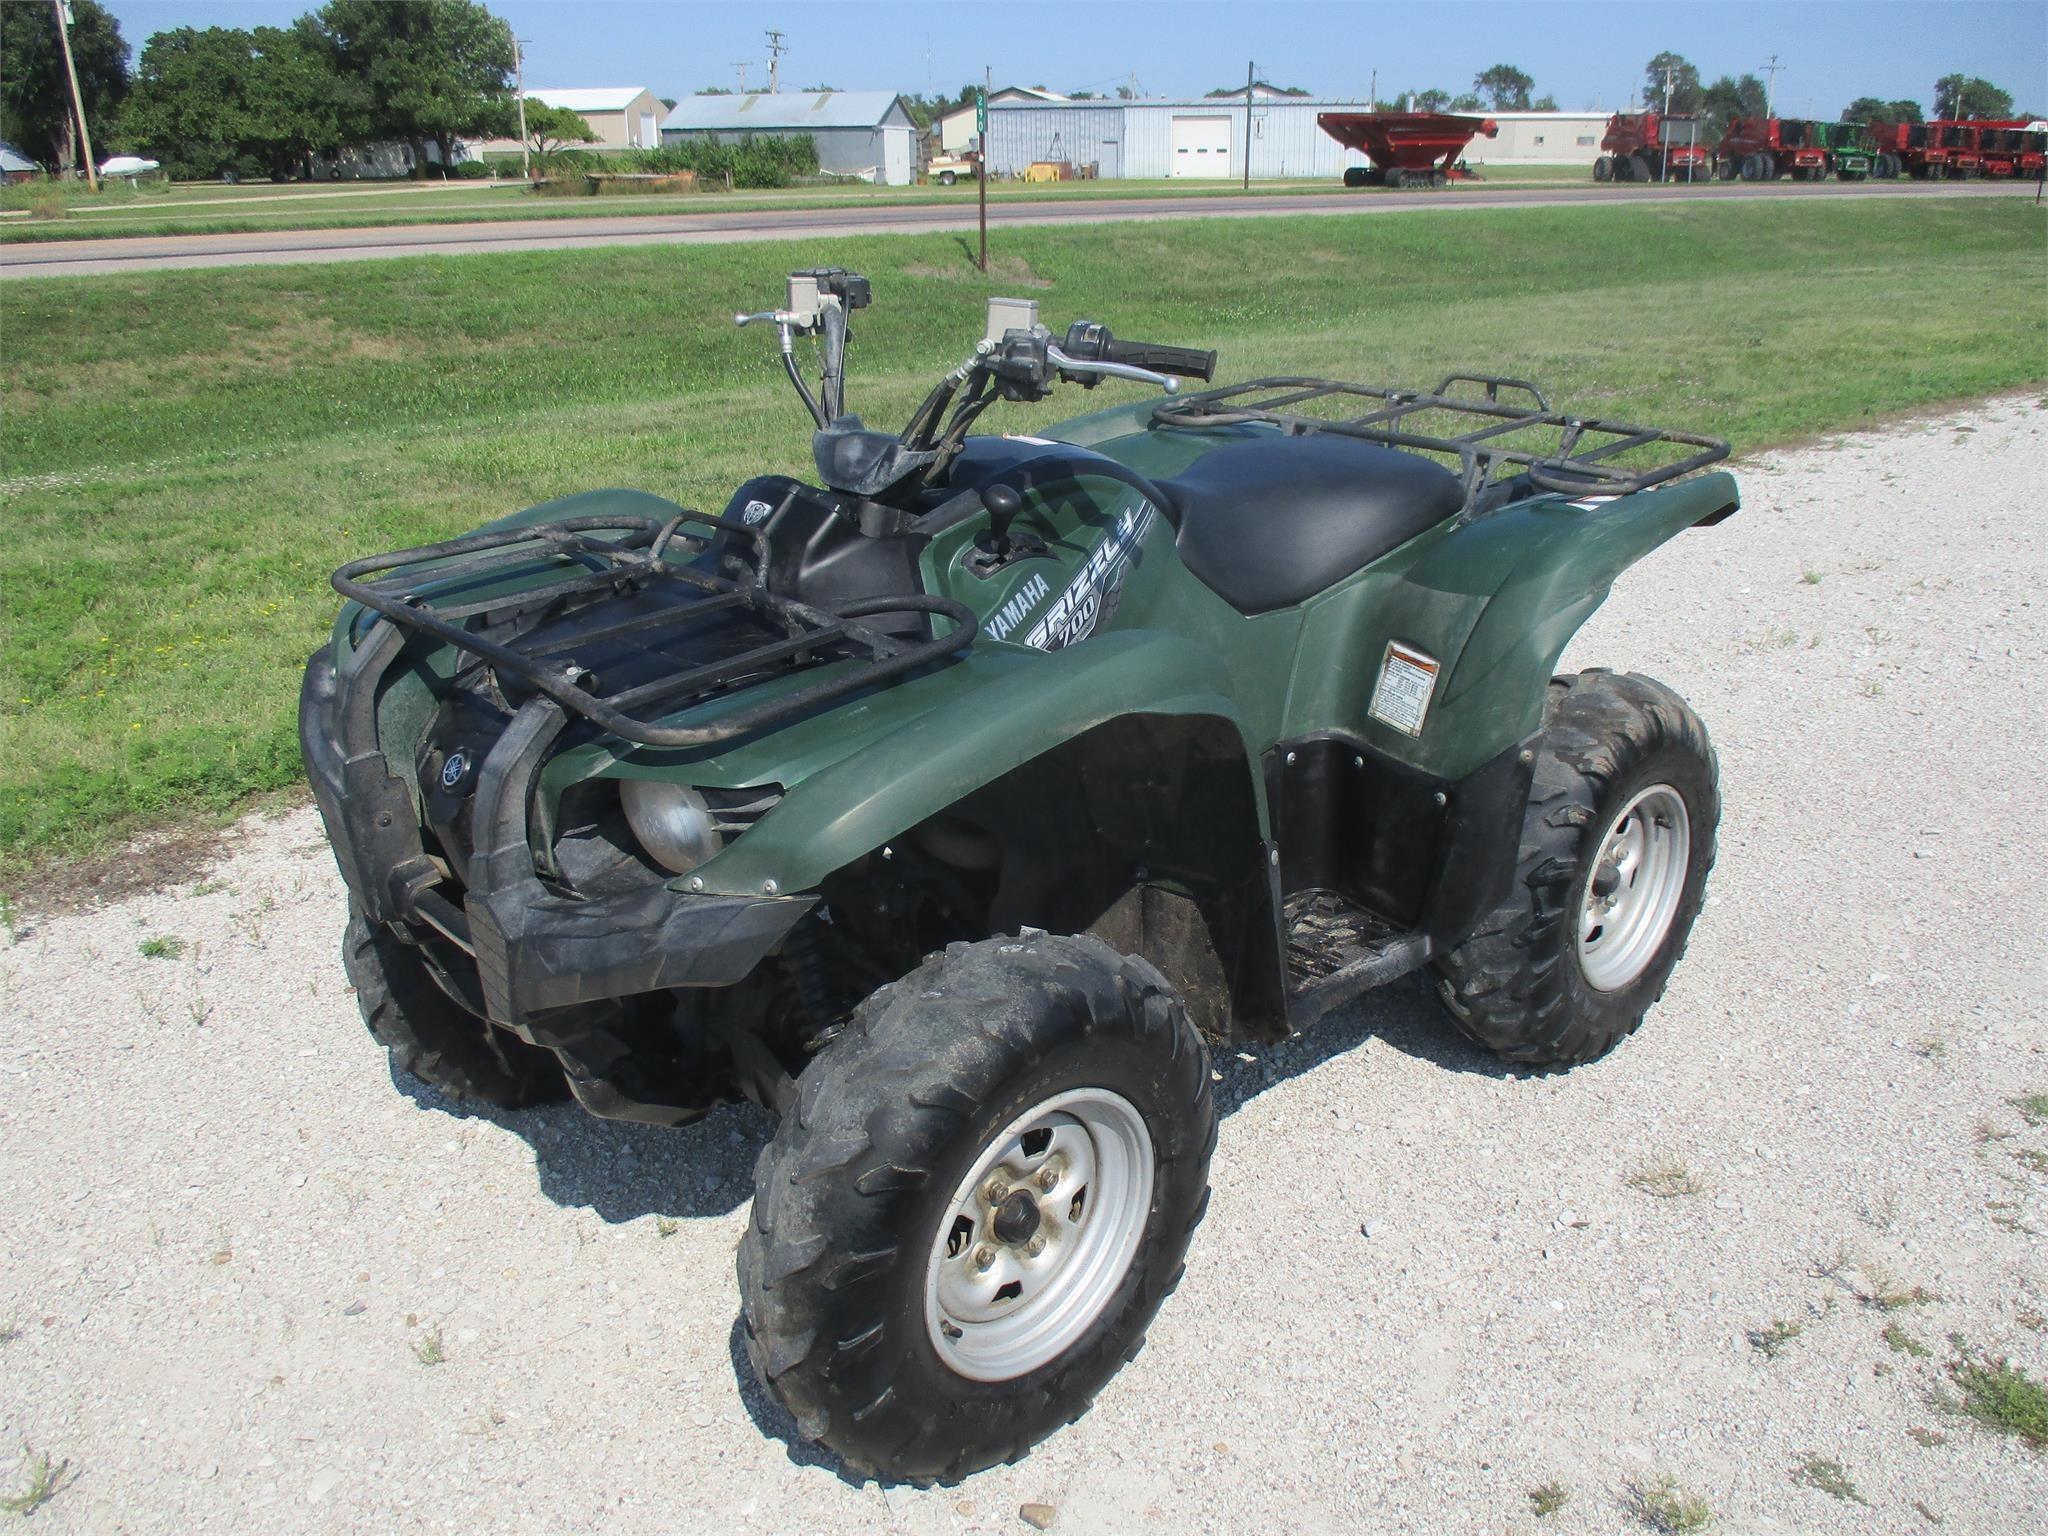 2015 Yamaha Grizzly 700EPS ATVs and Utility Vehicle